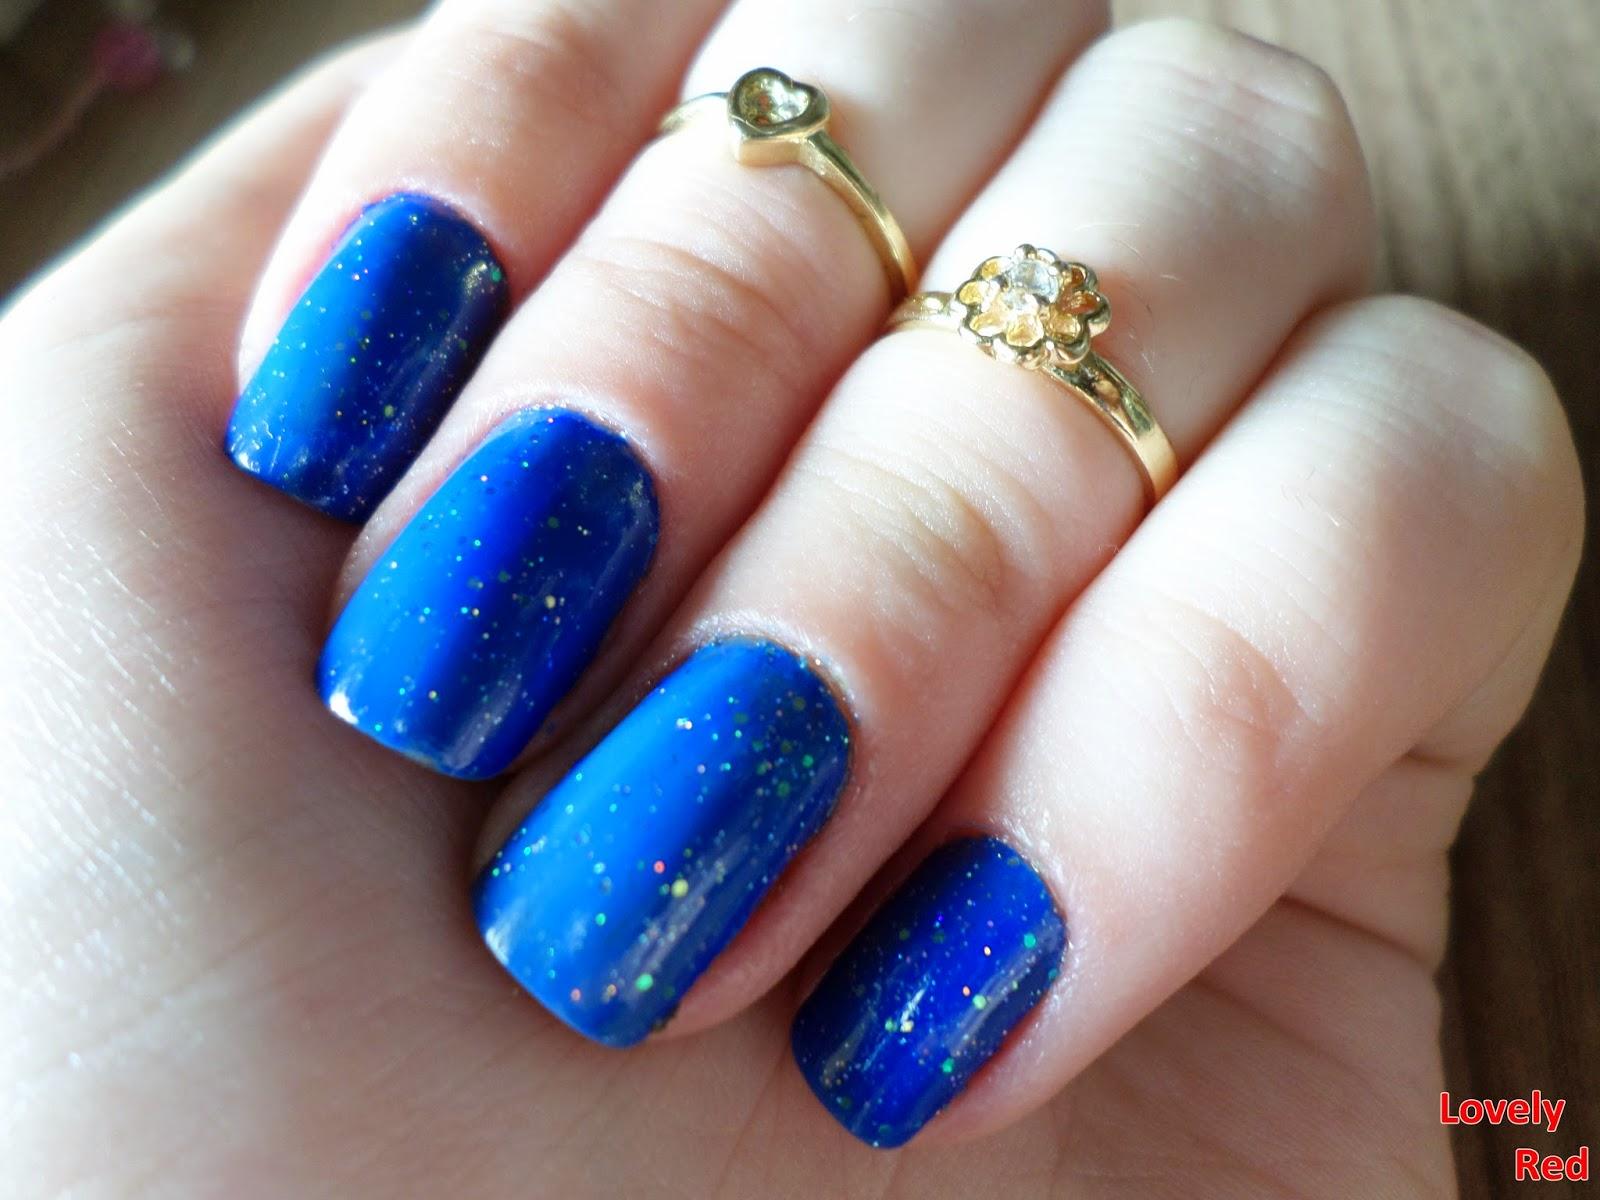 Esmalte da vez: Calafrio Azul, Saloon + Nuvem de paete, Risqué